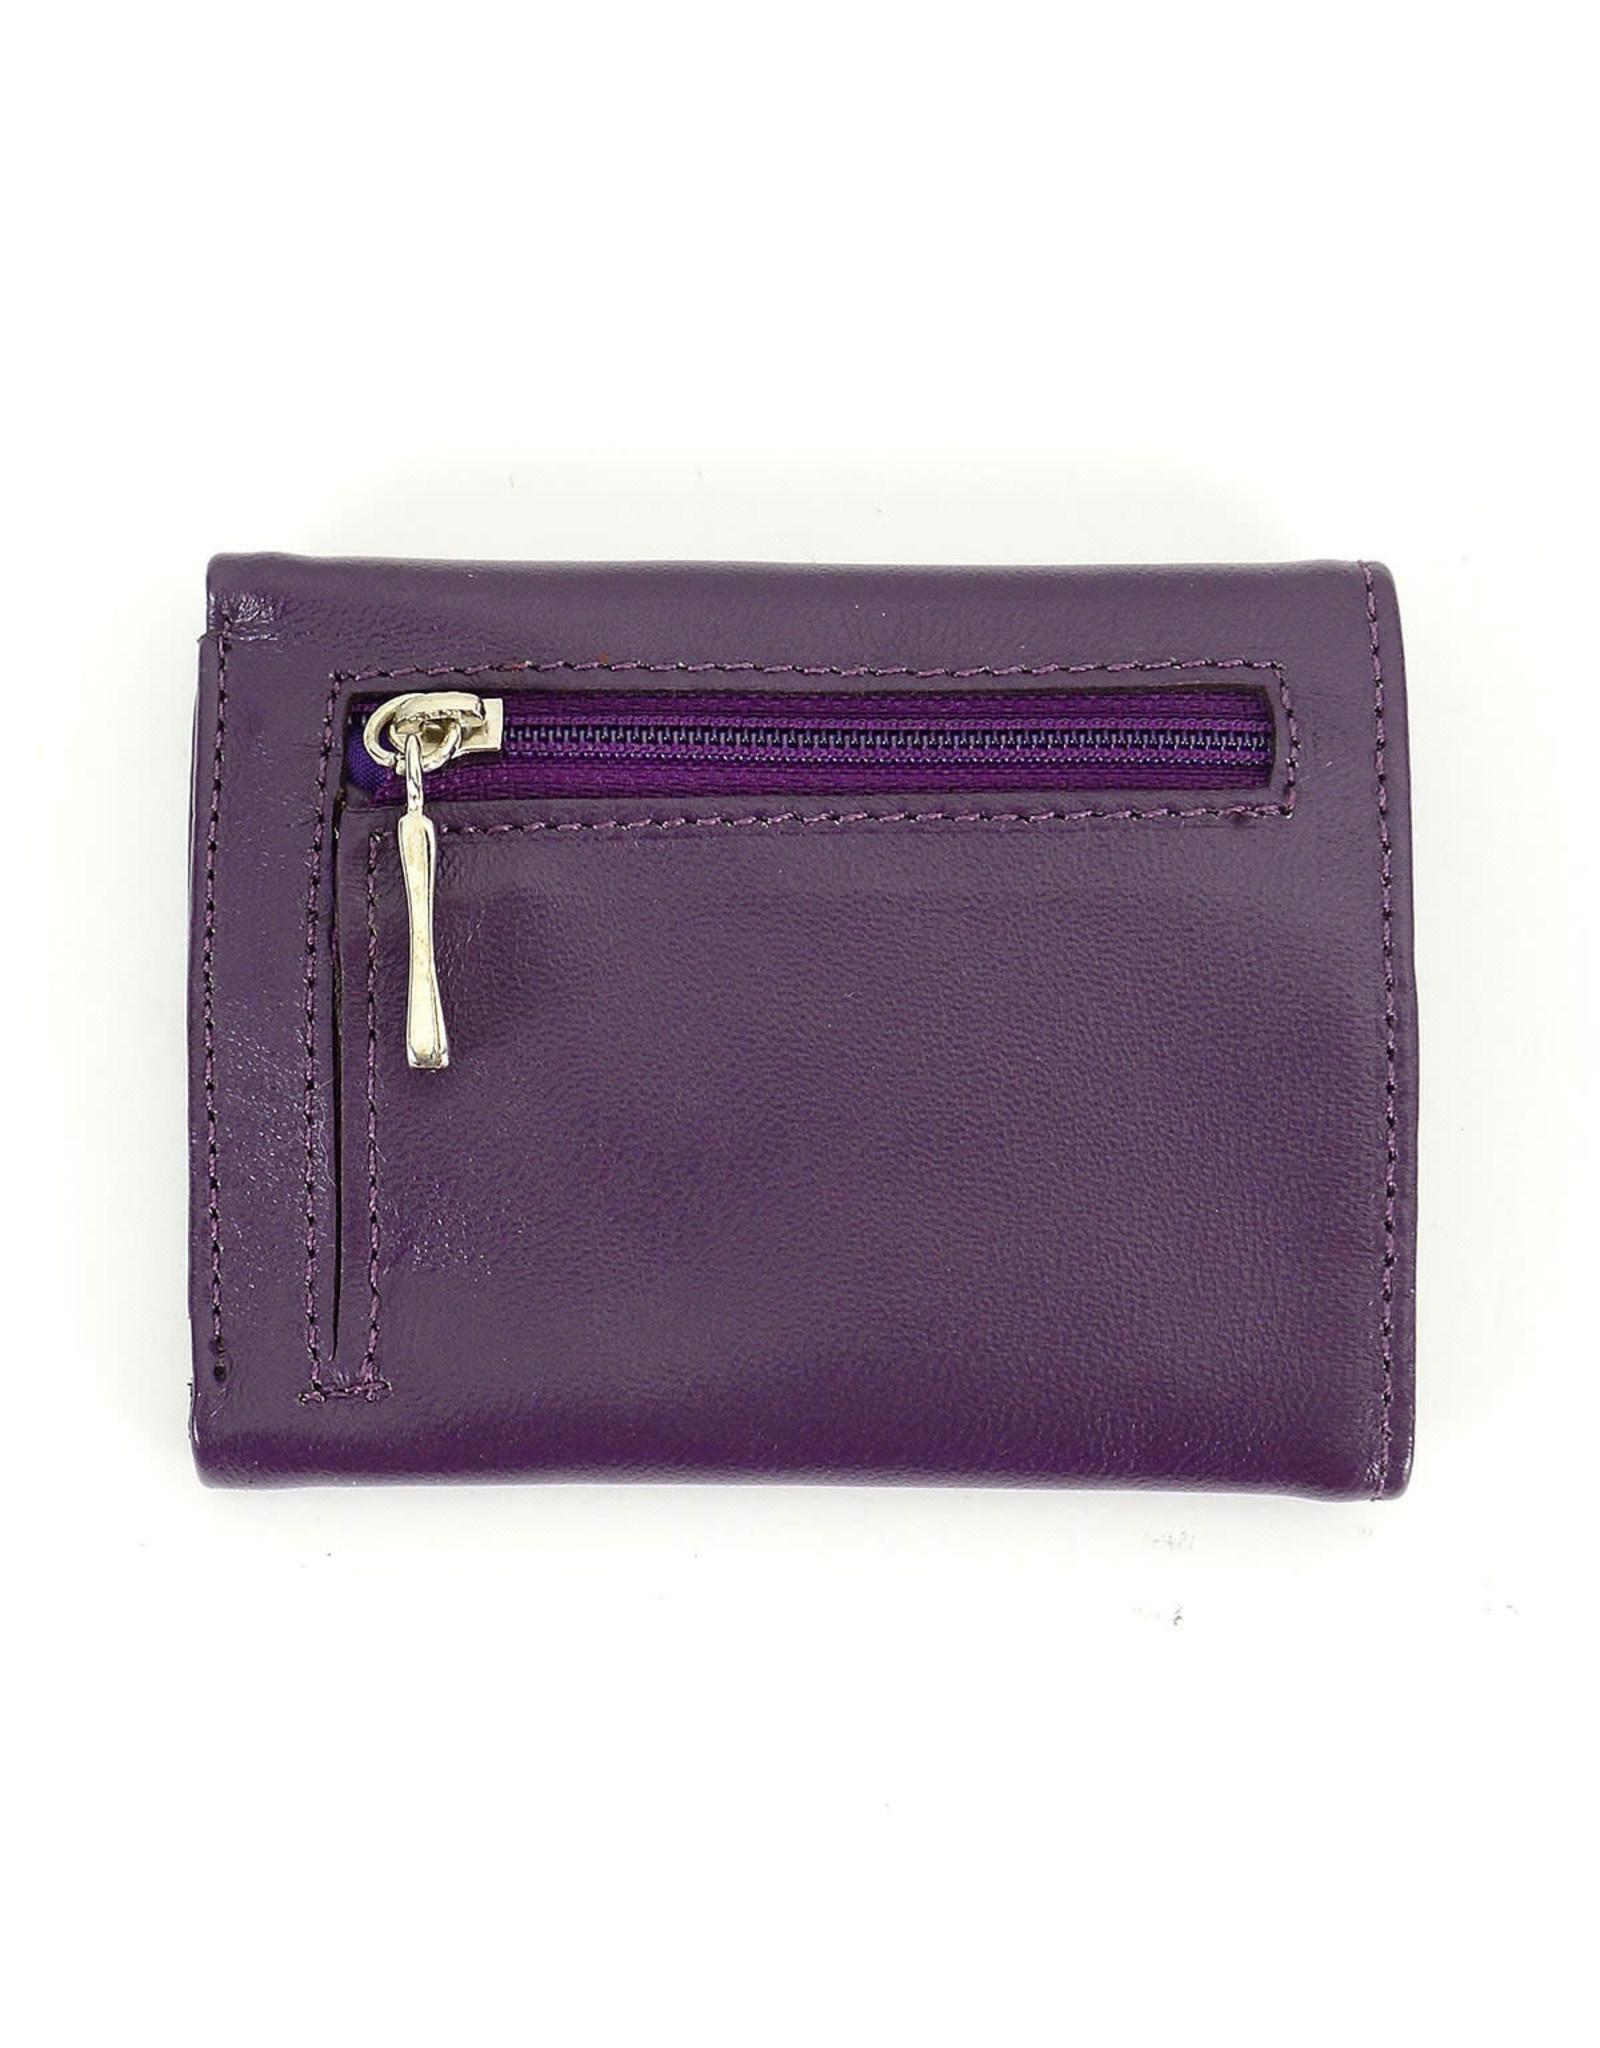 Minga Arco Small Leather Wallet, Peru.